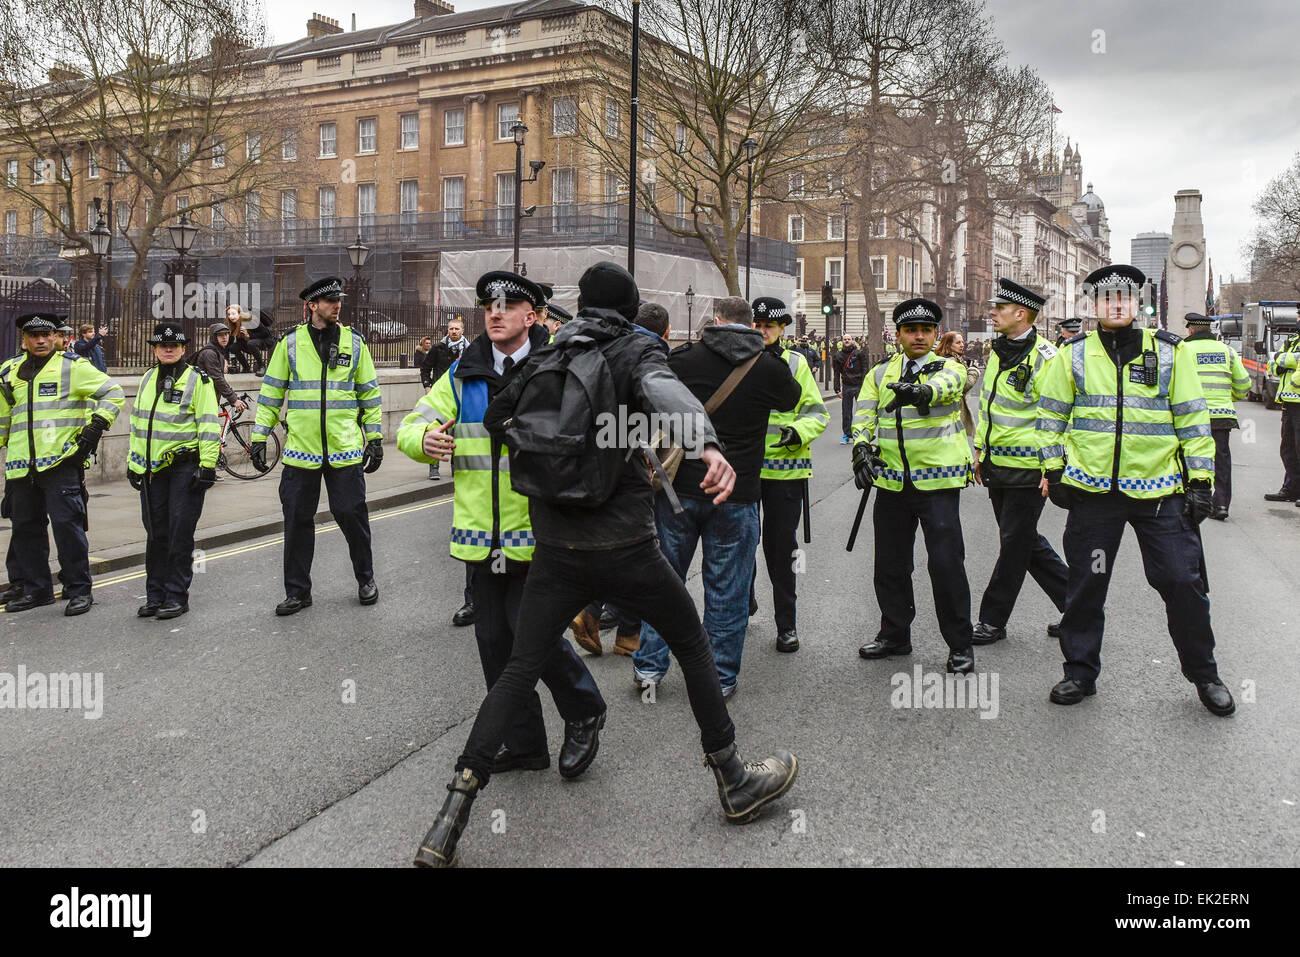 Antifascistas manifestándose contra Pergida en Whitehall. Imagen De Stock